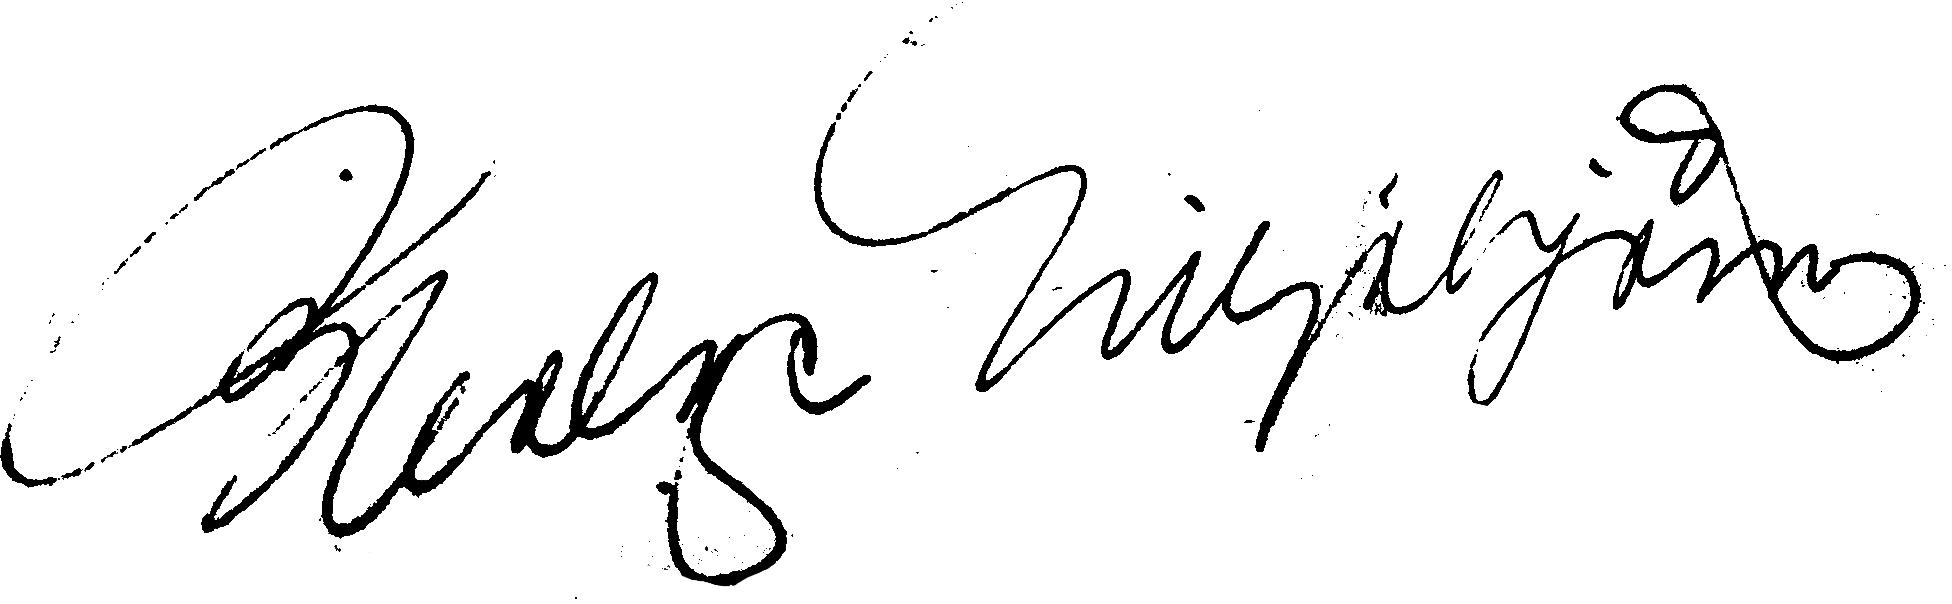 Helge Liljebjörn, signatur